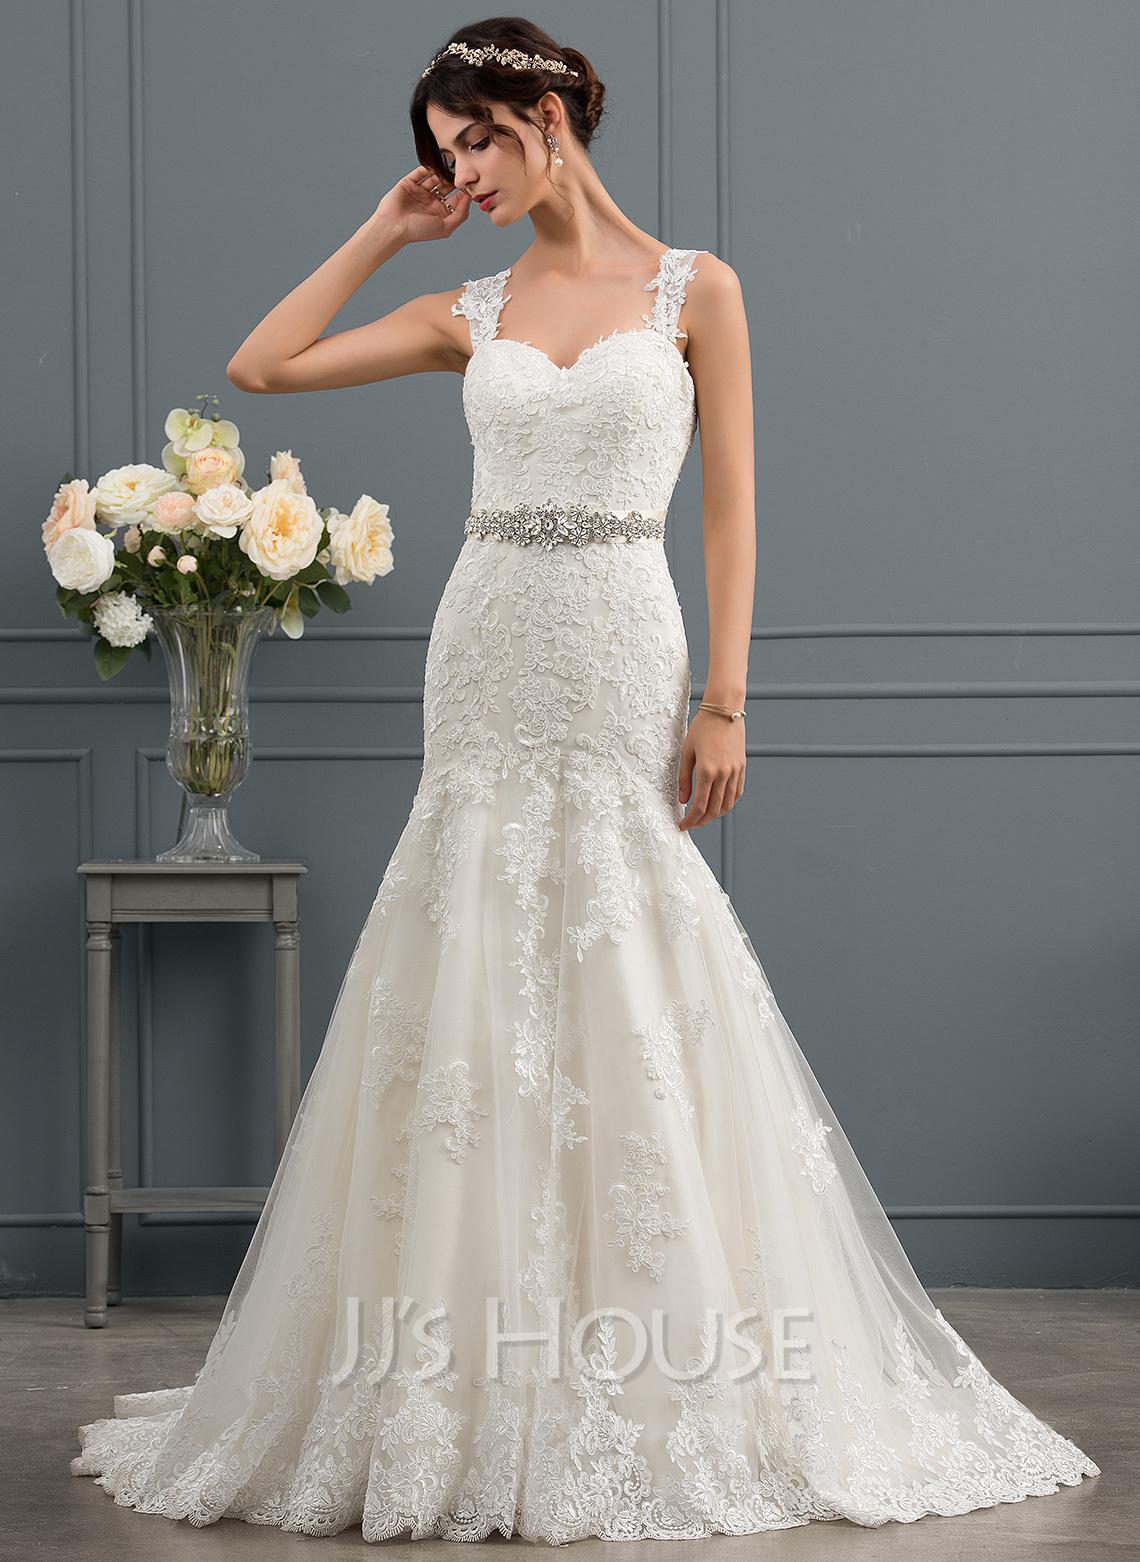 Trumpet/Mermaid Sweetheart Sweep Train Tulle Wedding Dress